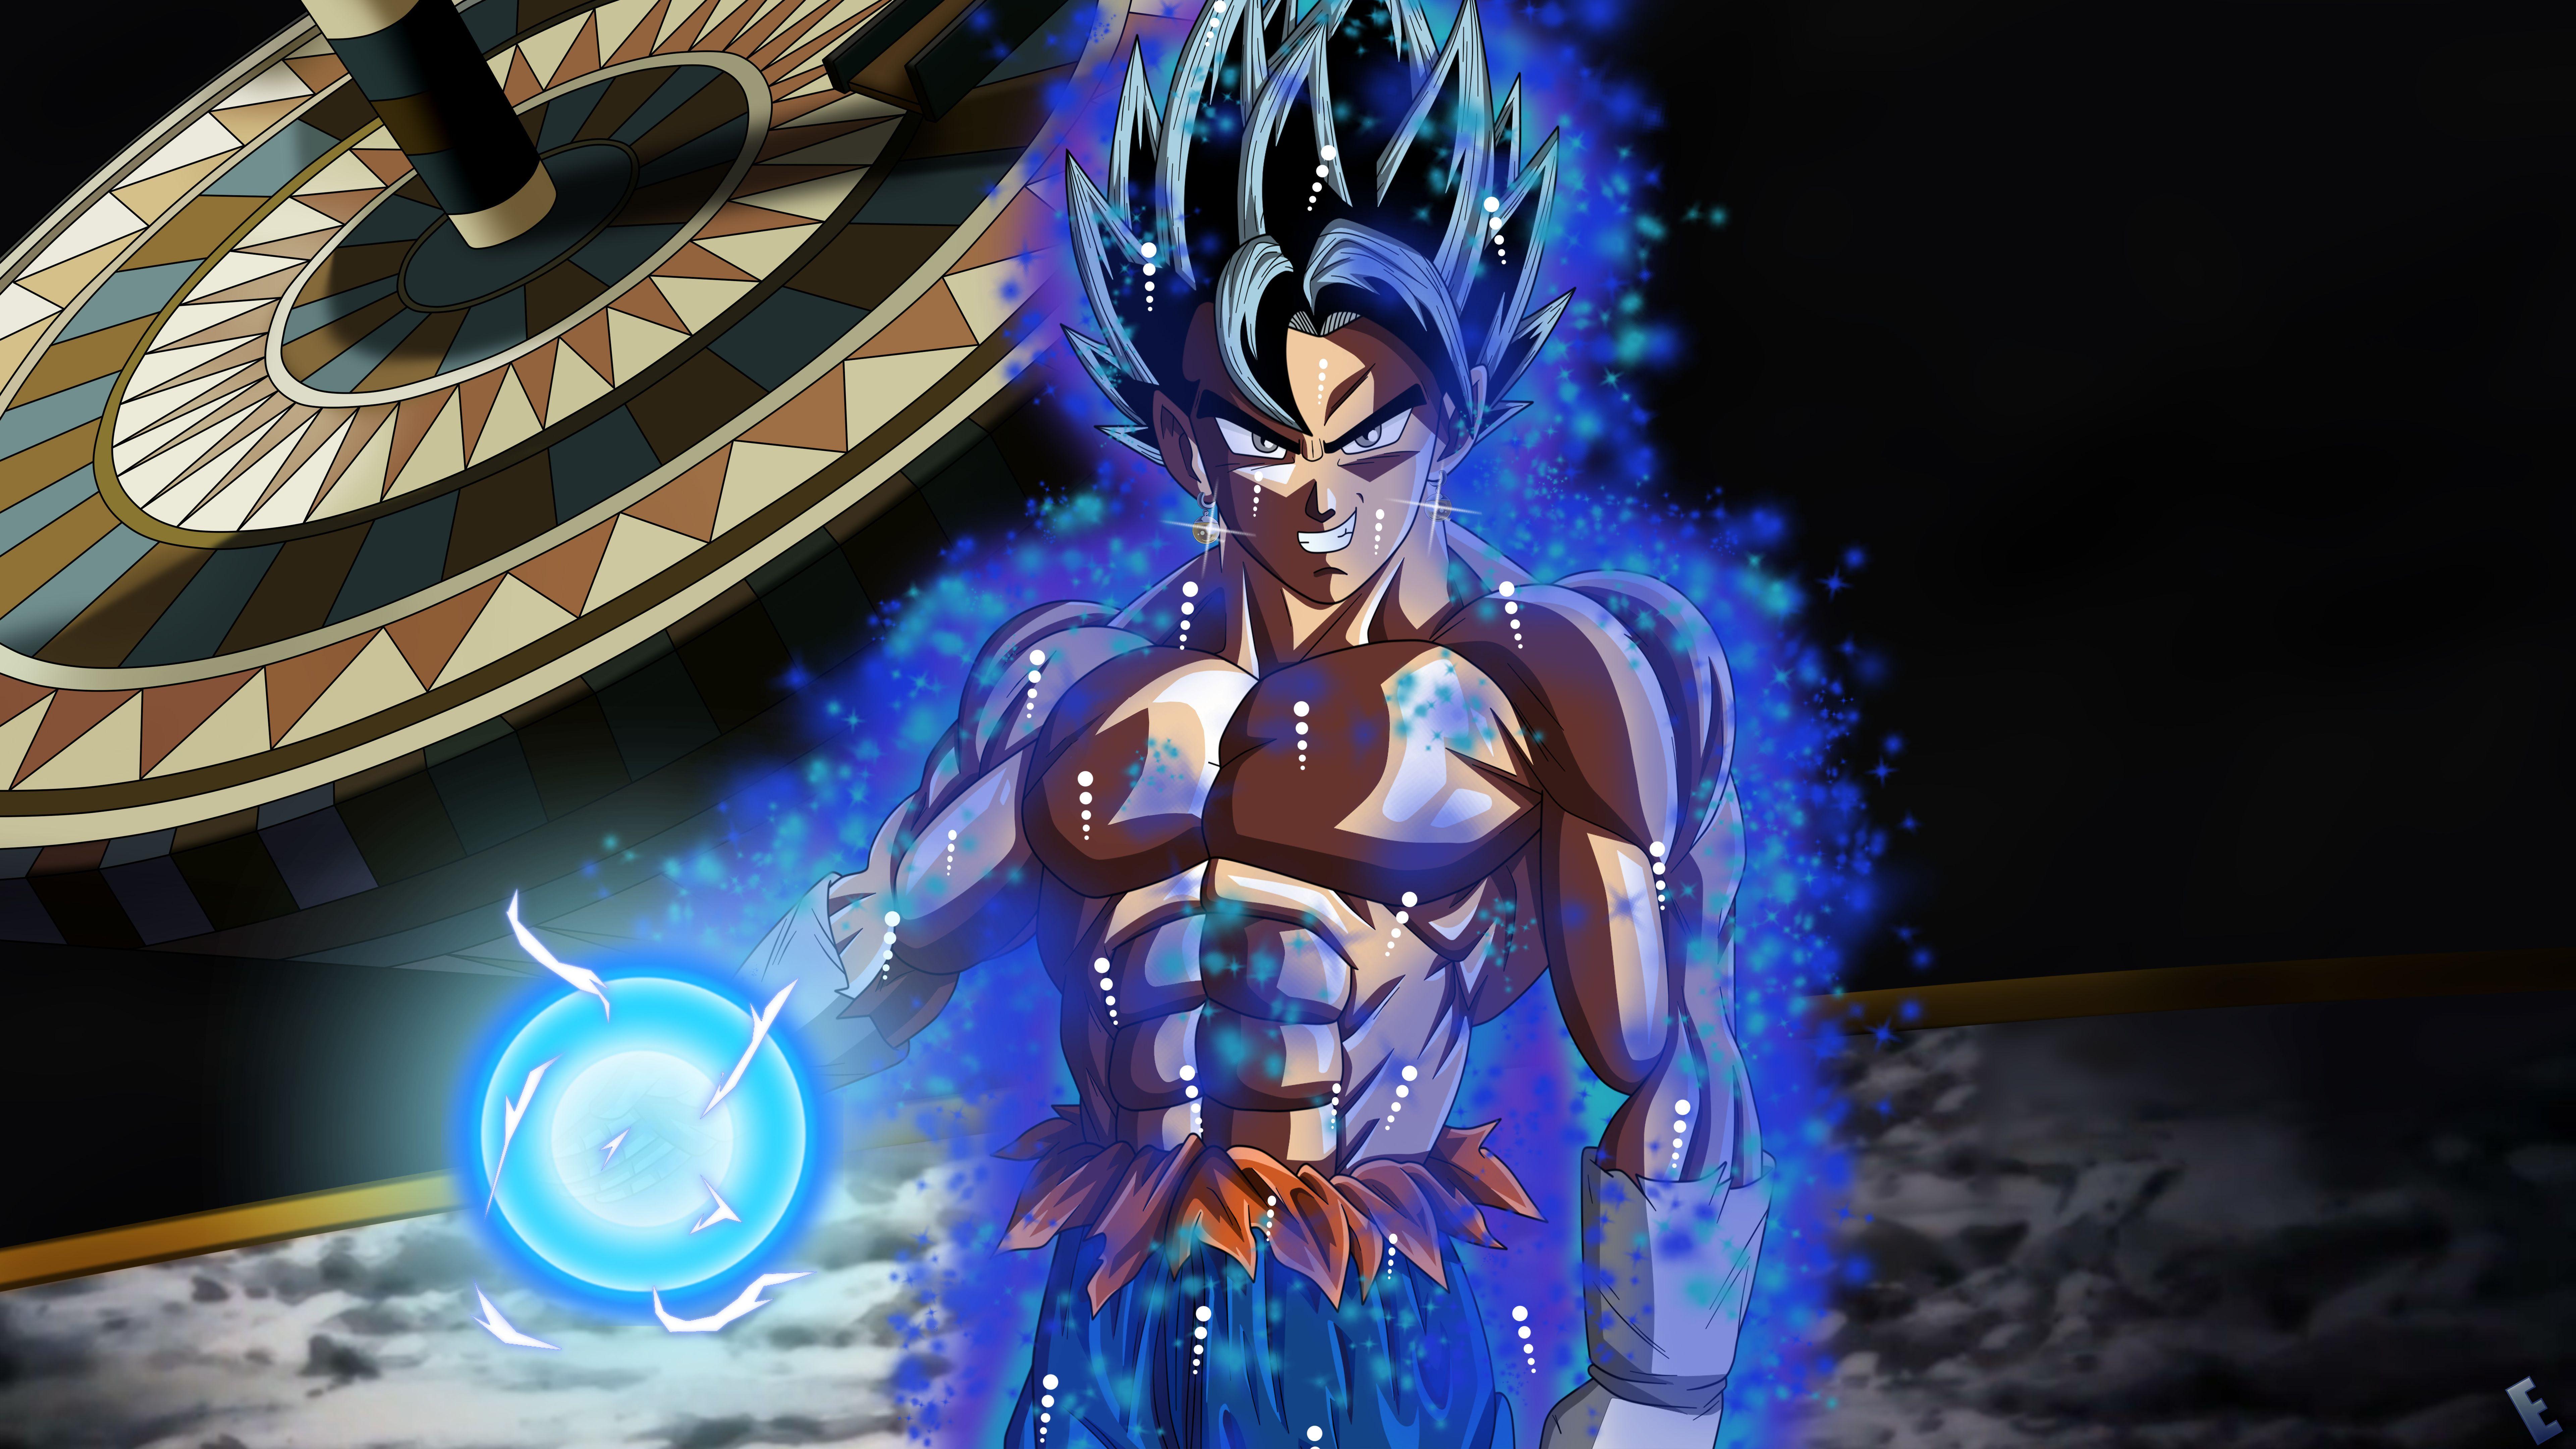 Goku 3d Wallpapers Wallpaper Cave